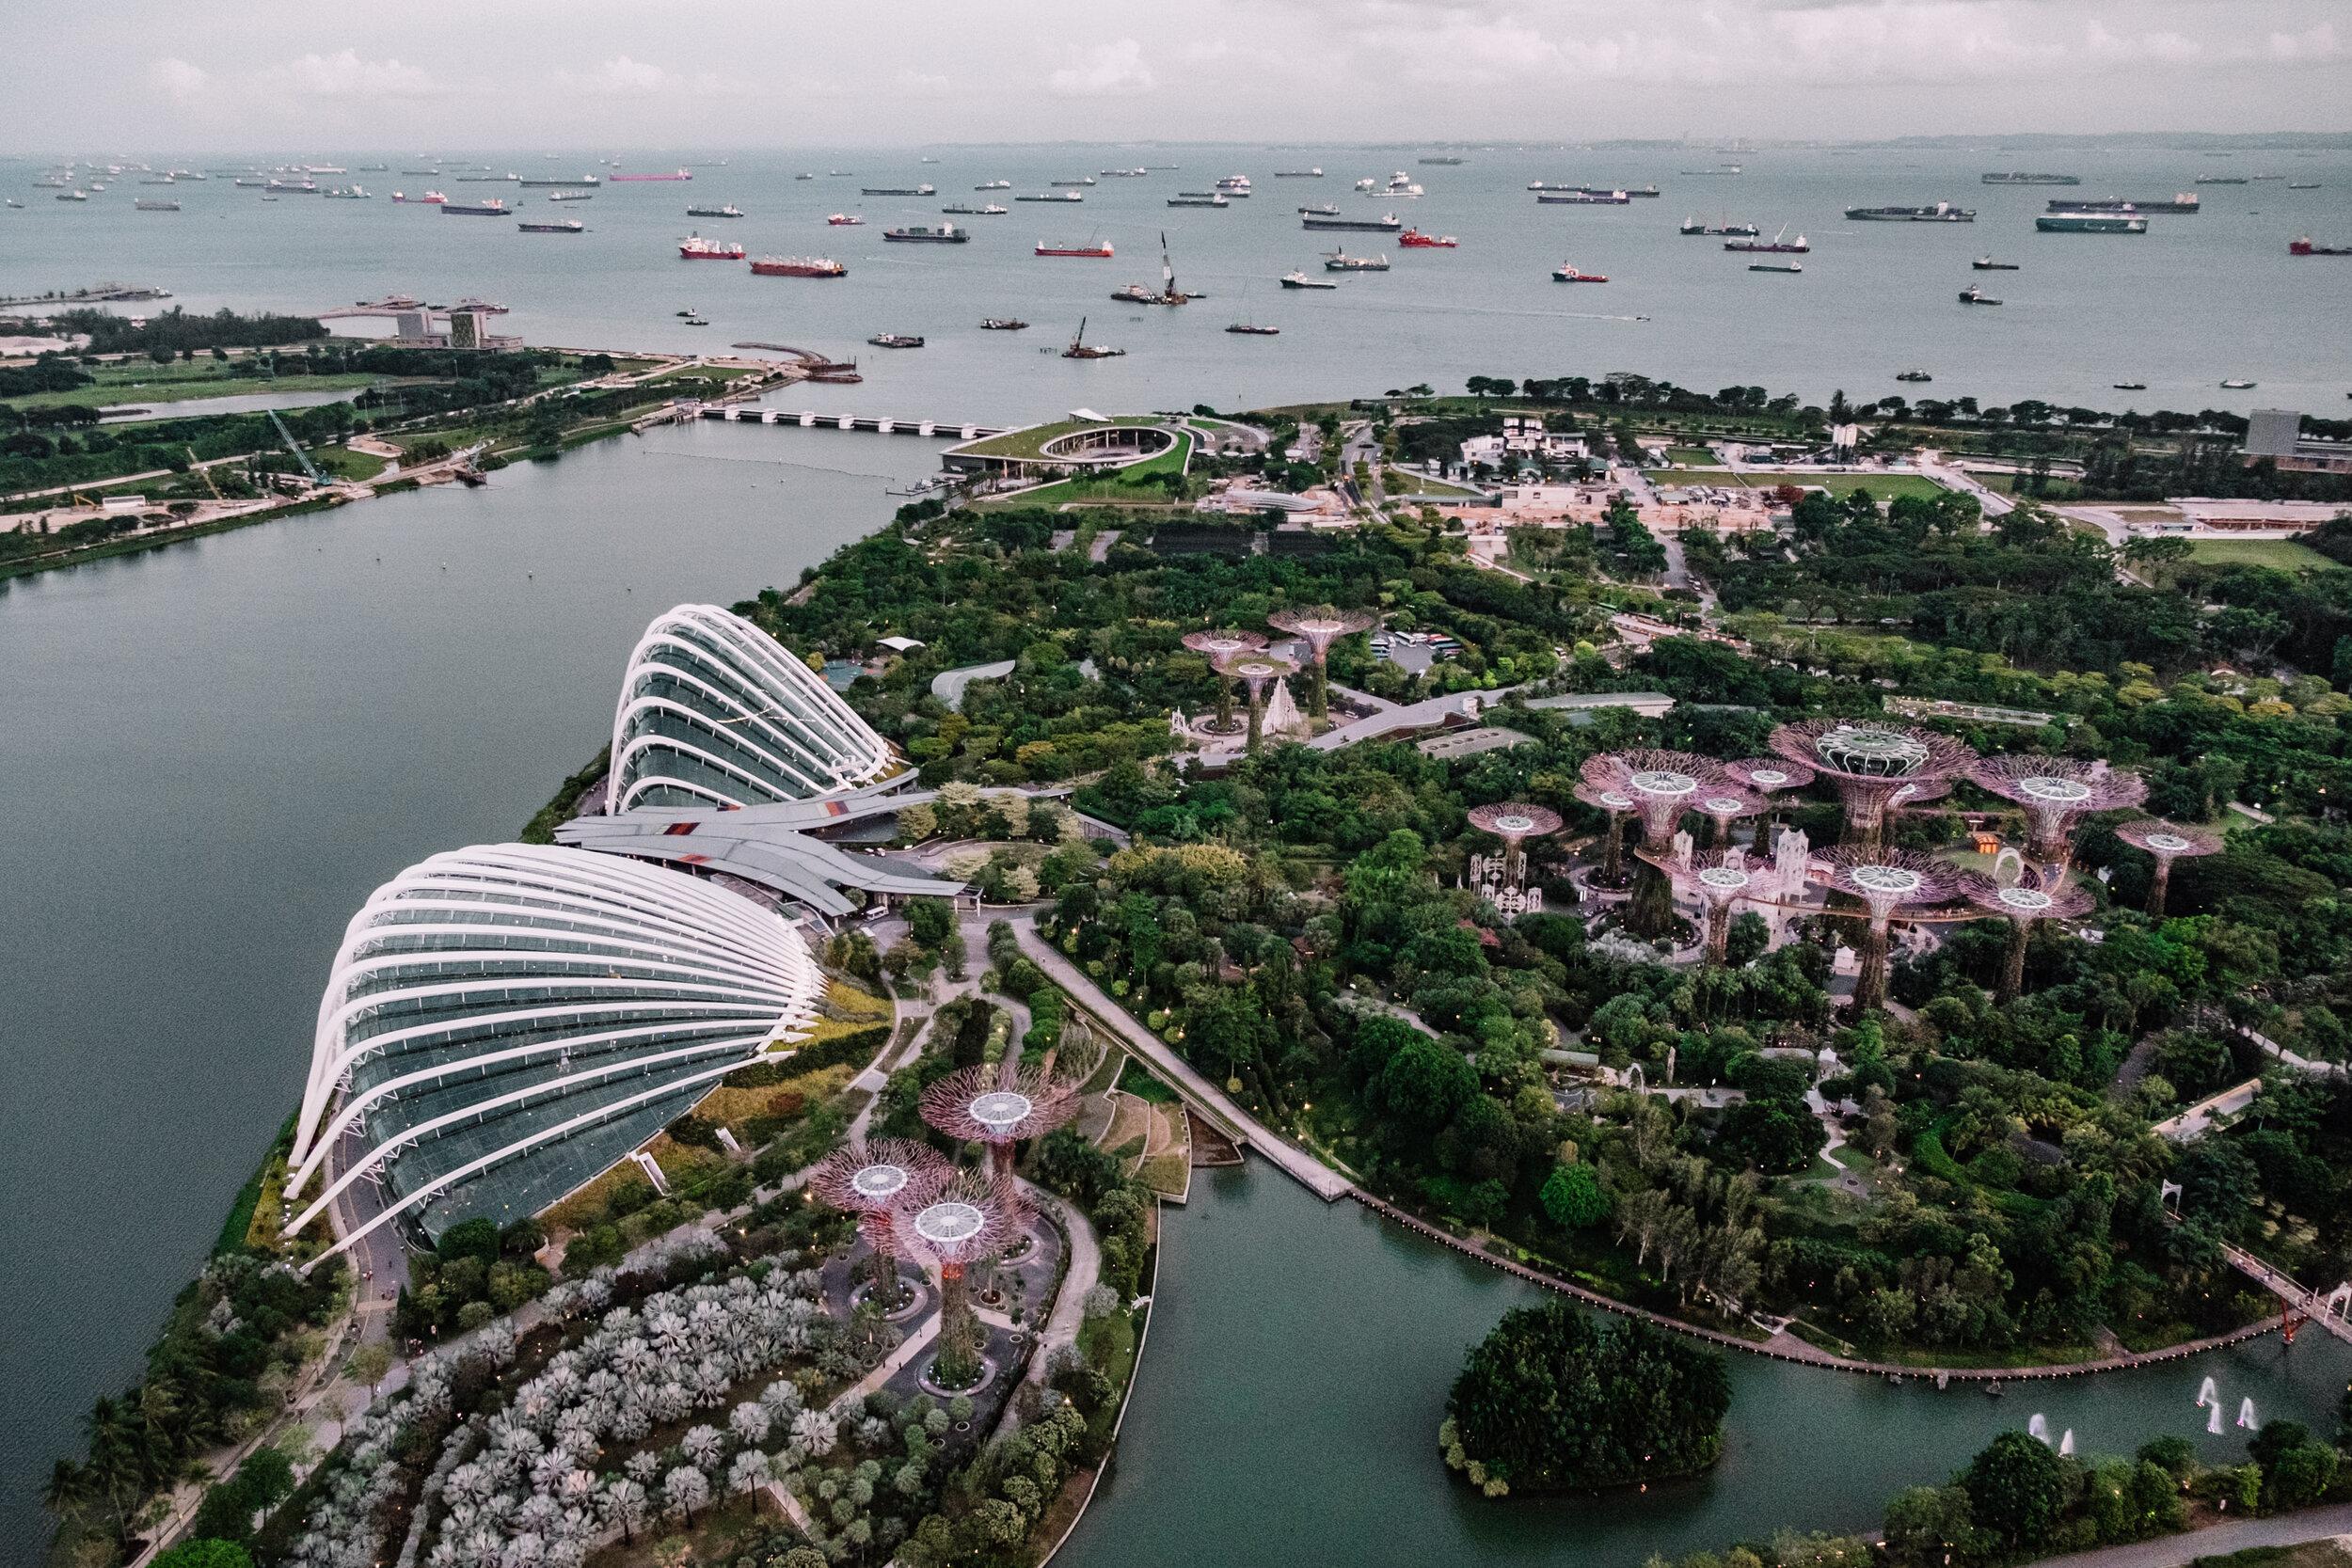 Rachel Off Duty: Marina Bay Sands SkyPark View